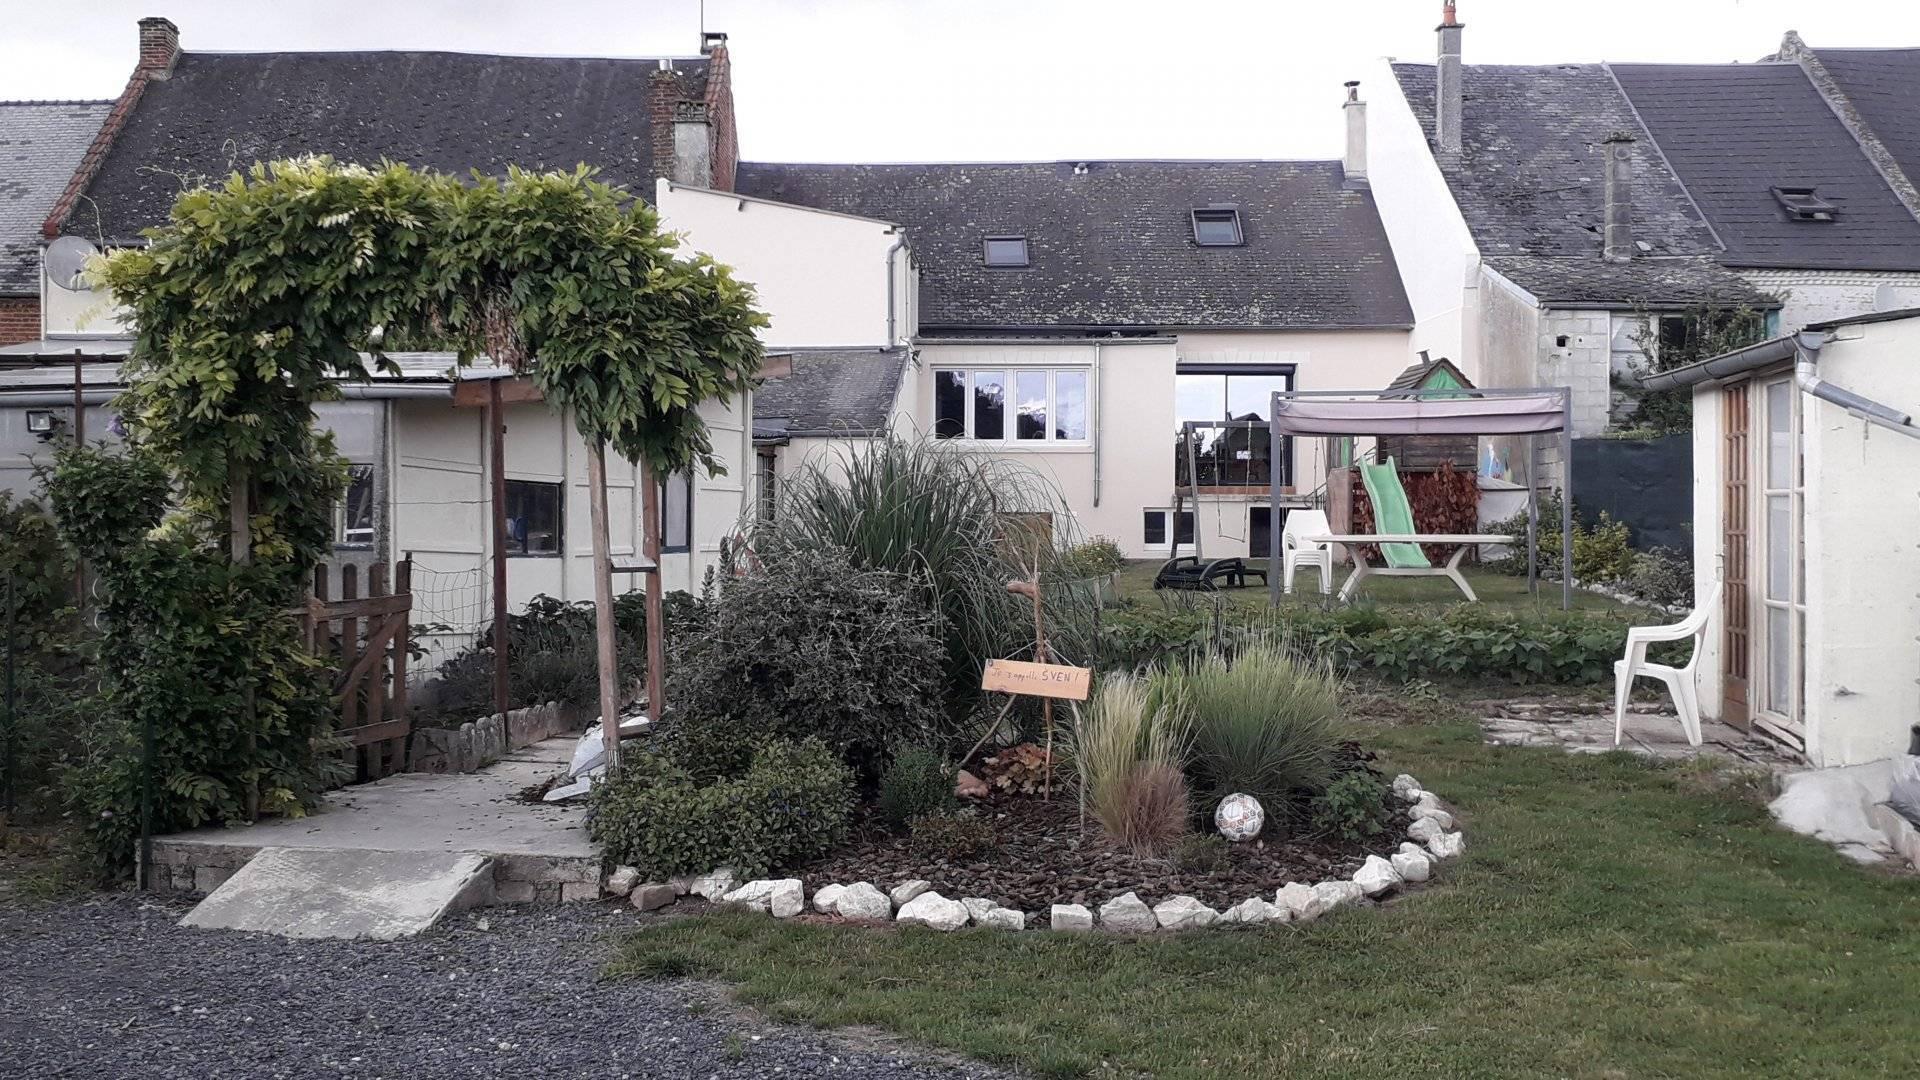 1 18 Crécy-sur-Serre